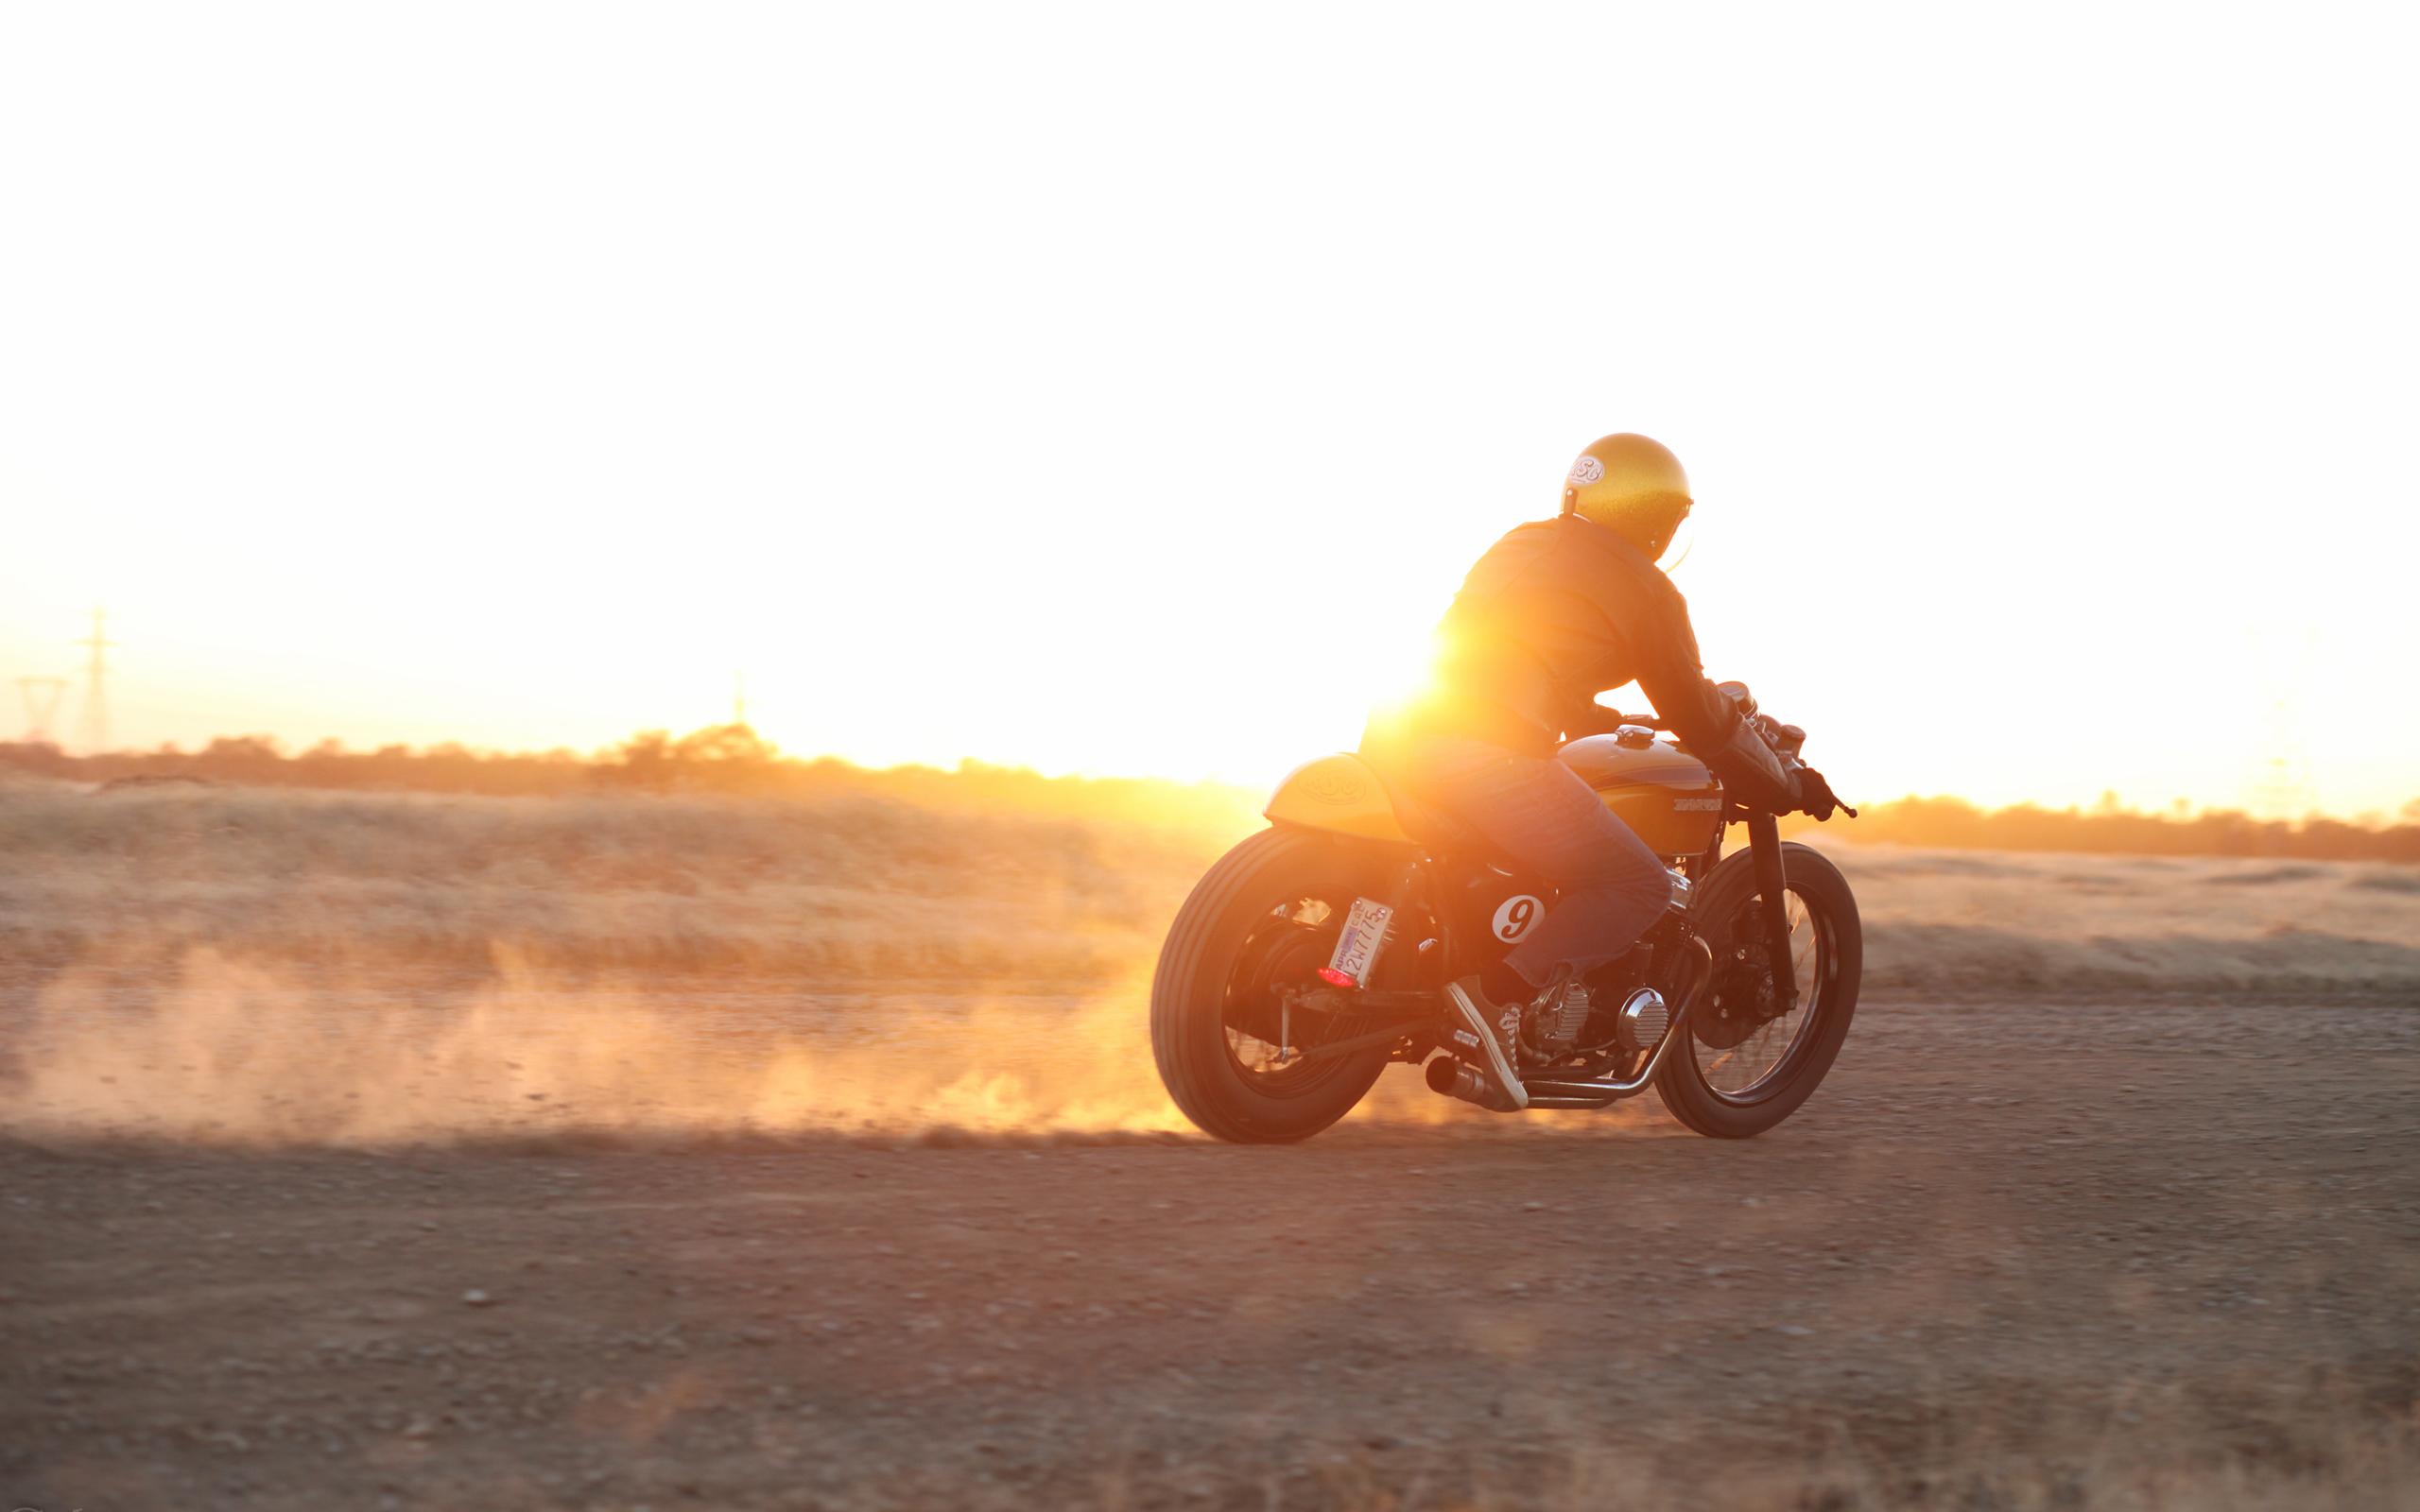 Motorcycle Racing Wallpaper 2560x1600